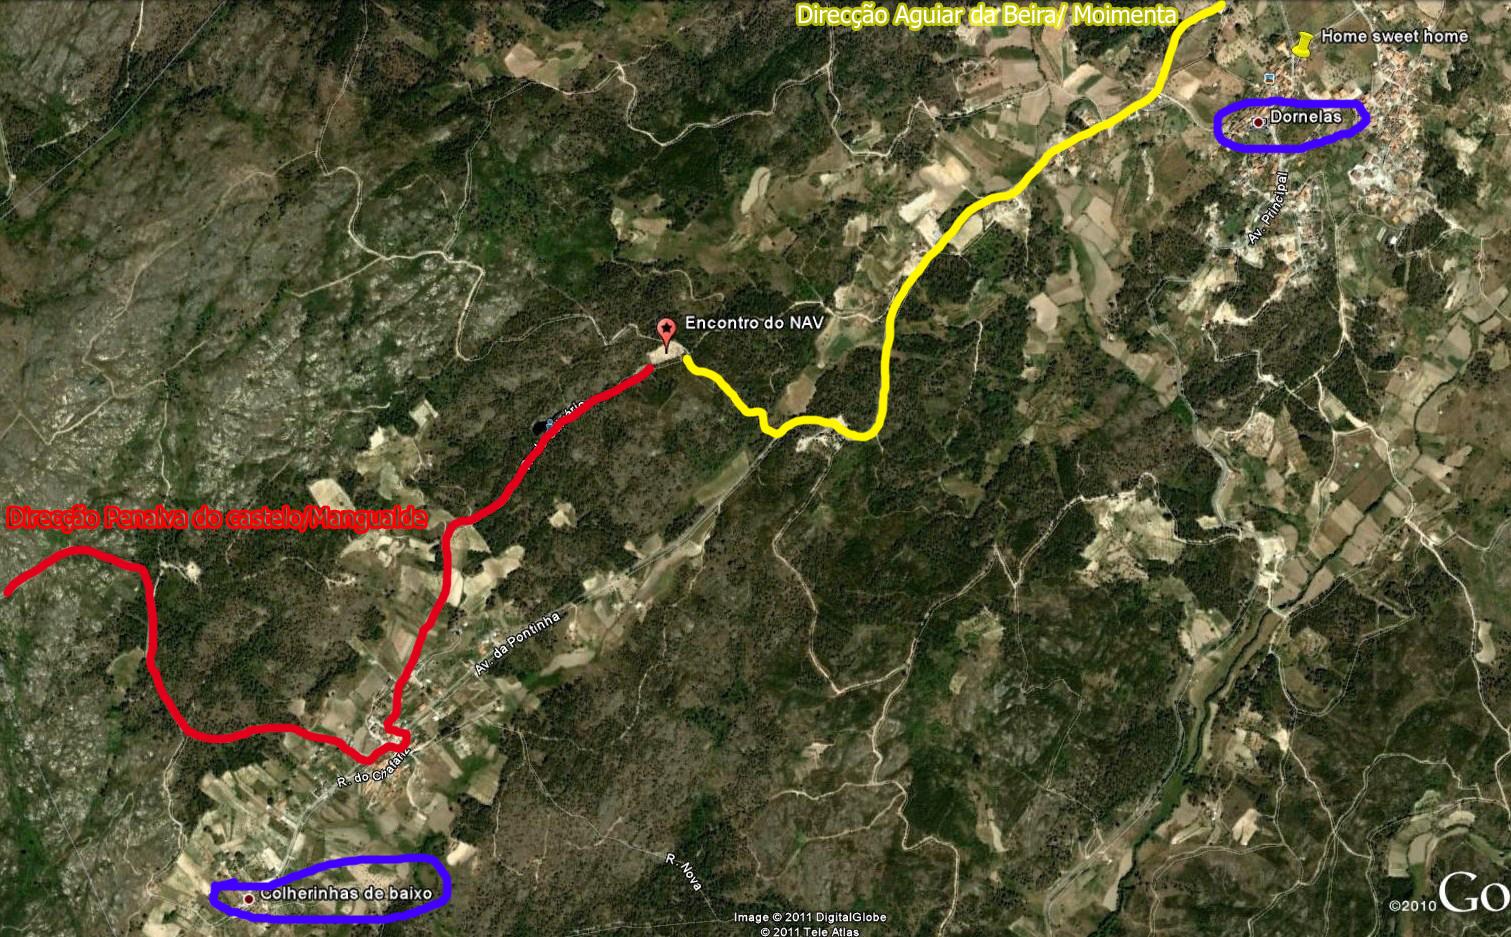 Mapa Dornelas/Colherinhas